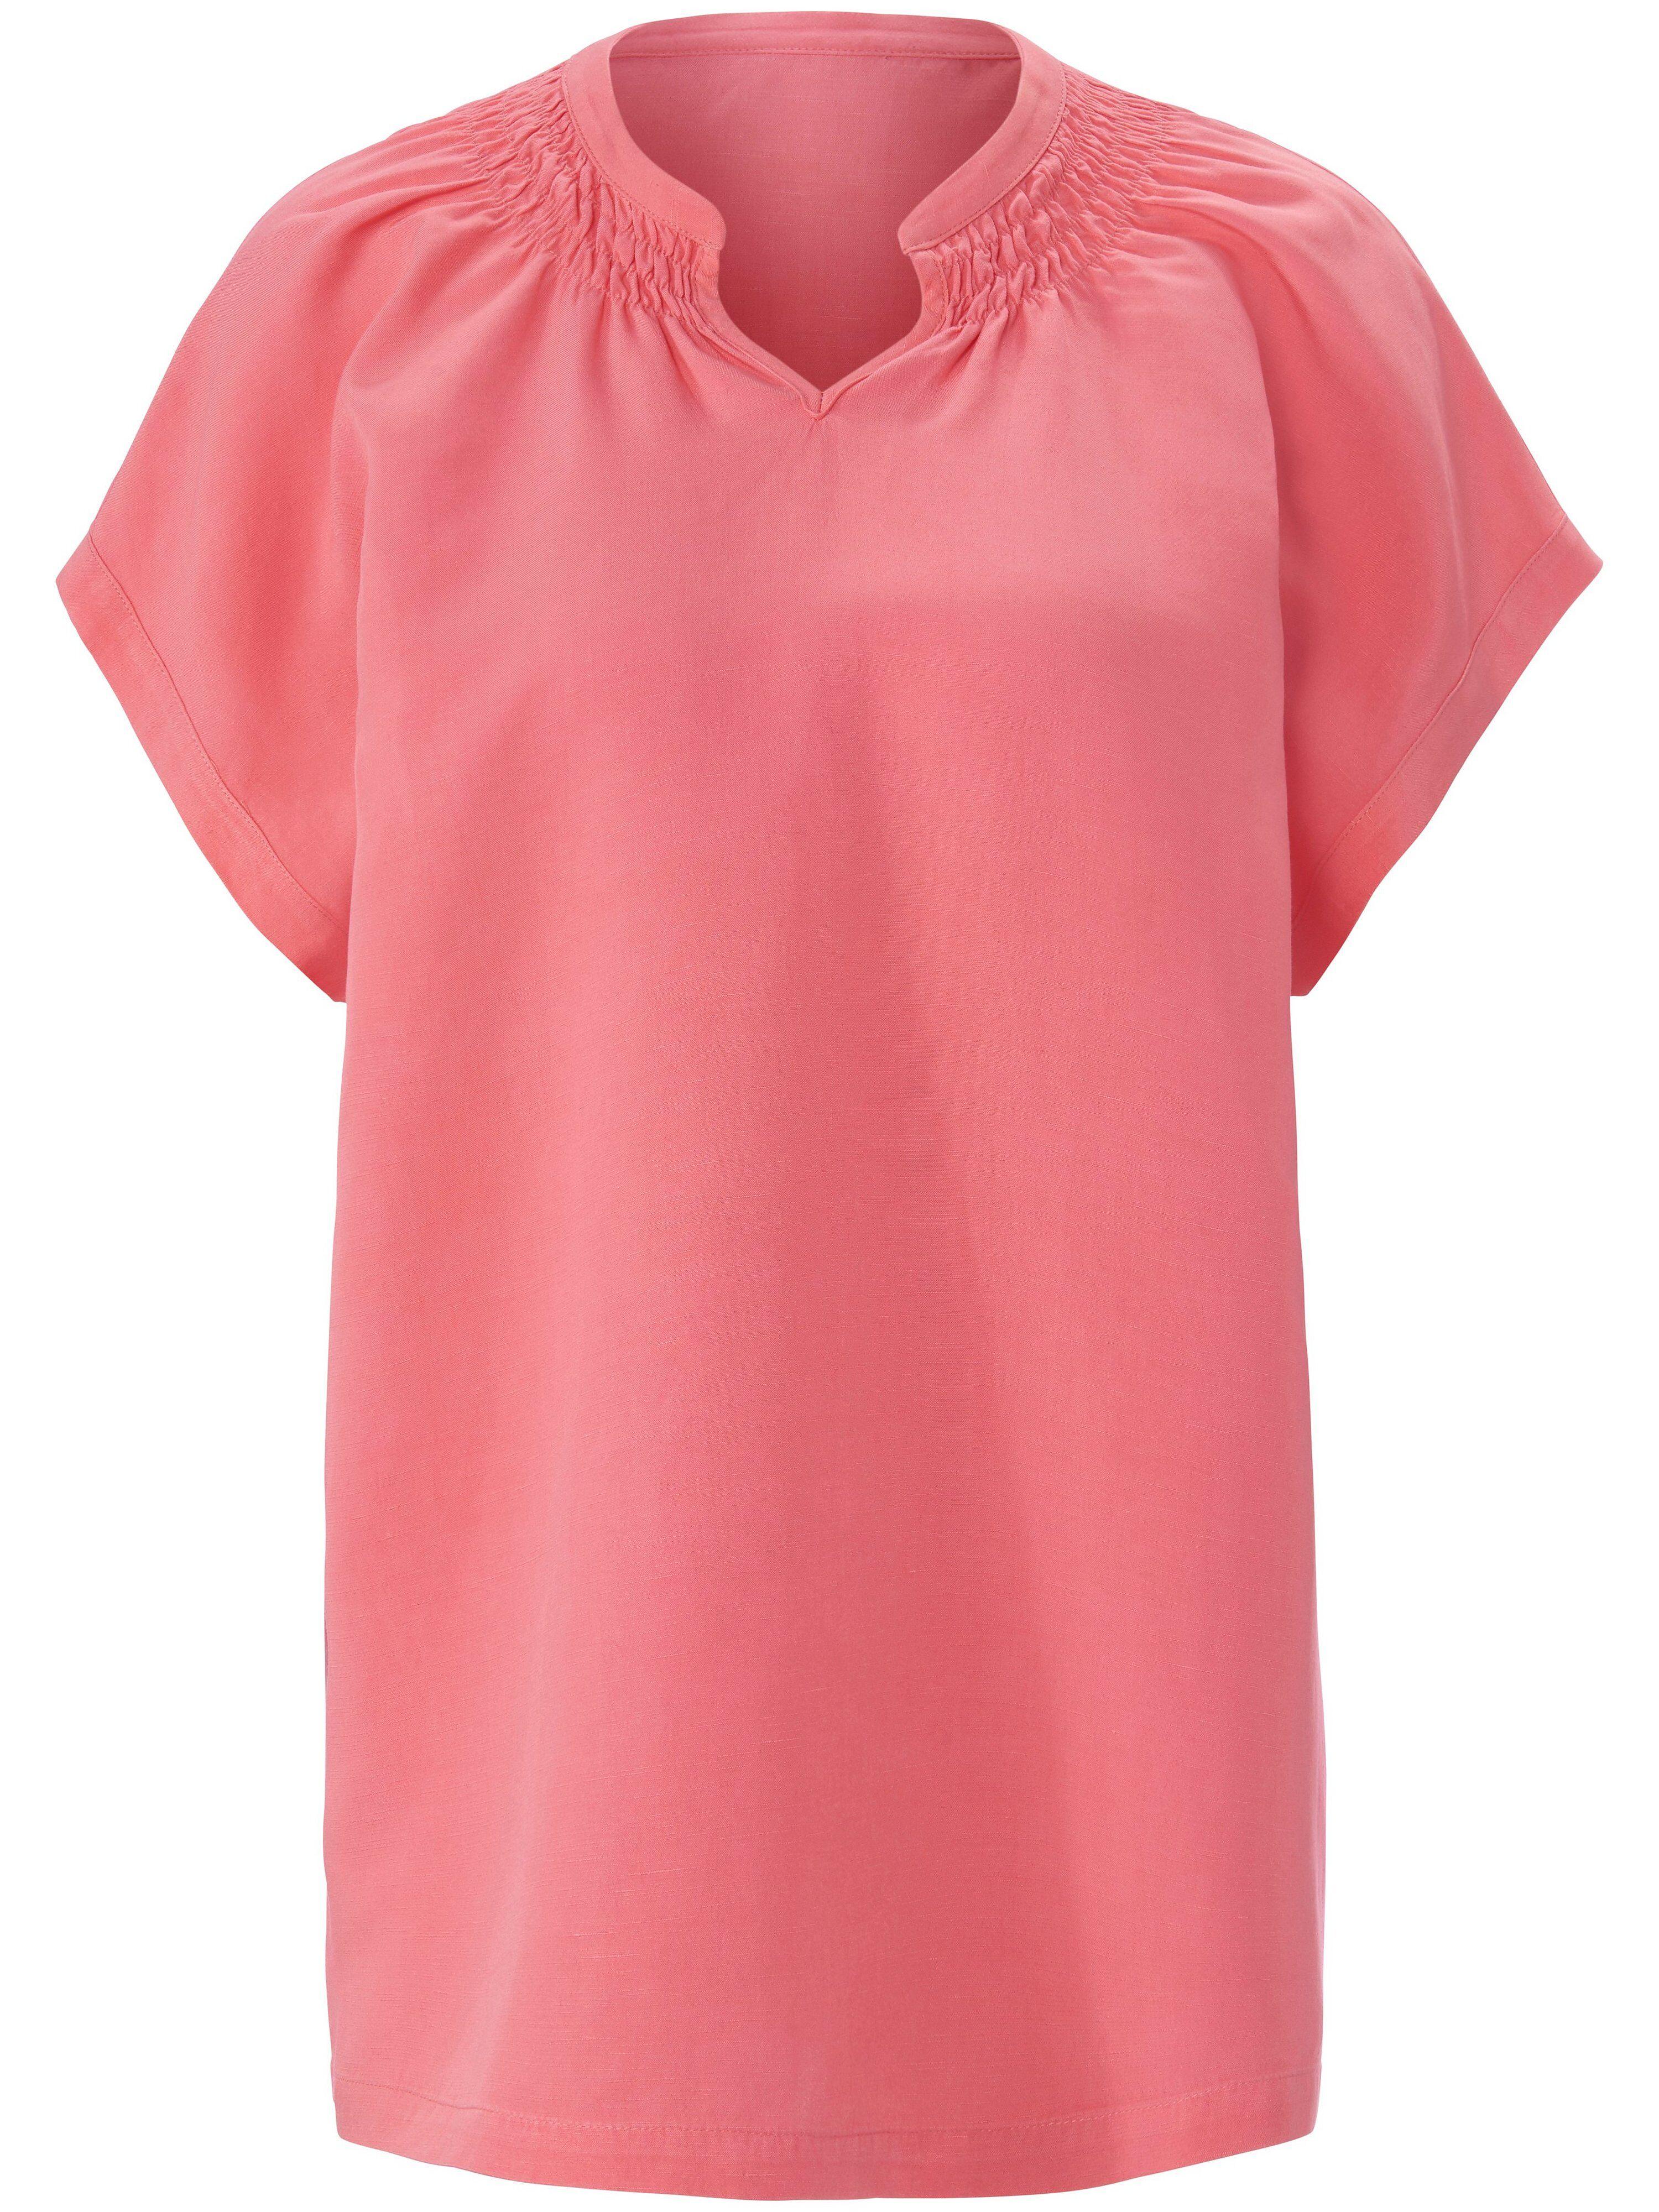 MYBC La blouse ligne à enfiler  MYBC orange  - Femme - 38